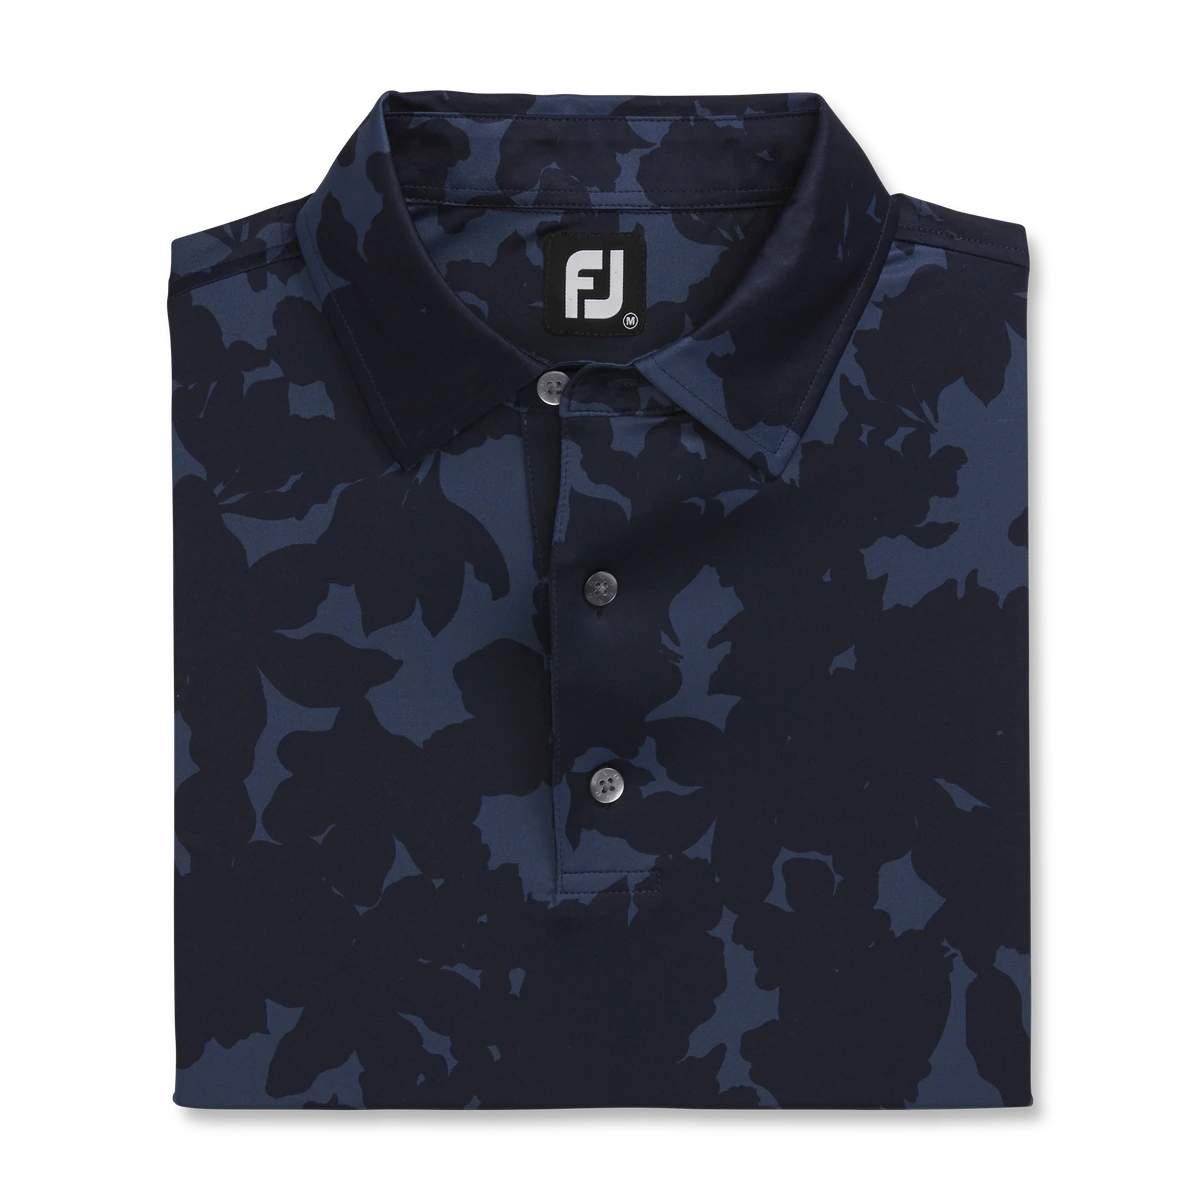 FootJoy Men's Lisle Camo Floral Print Navy Polo